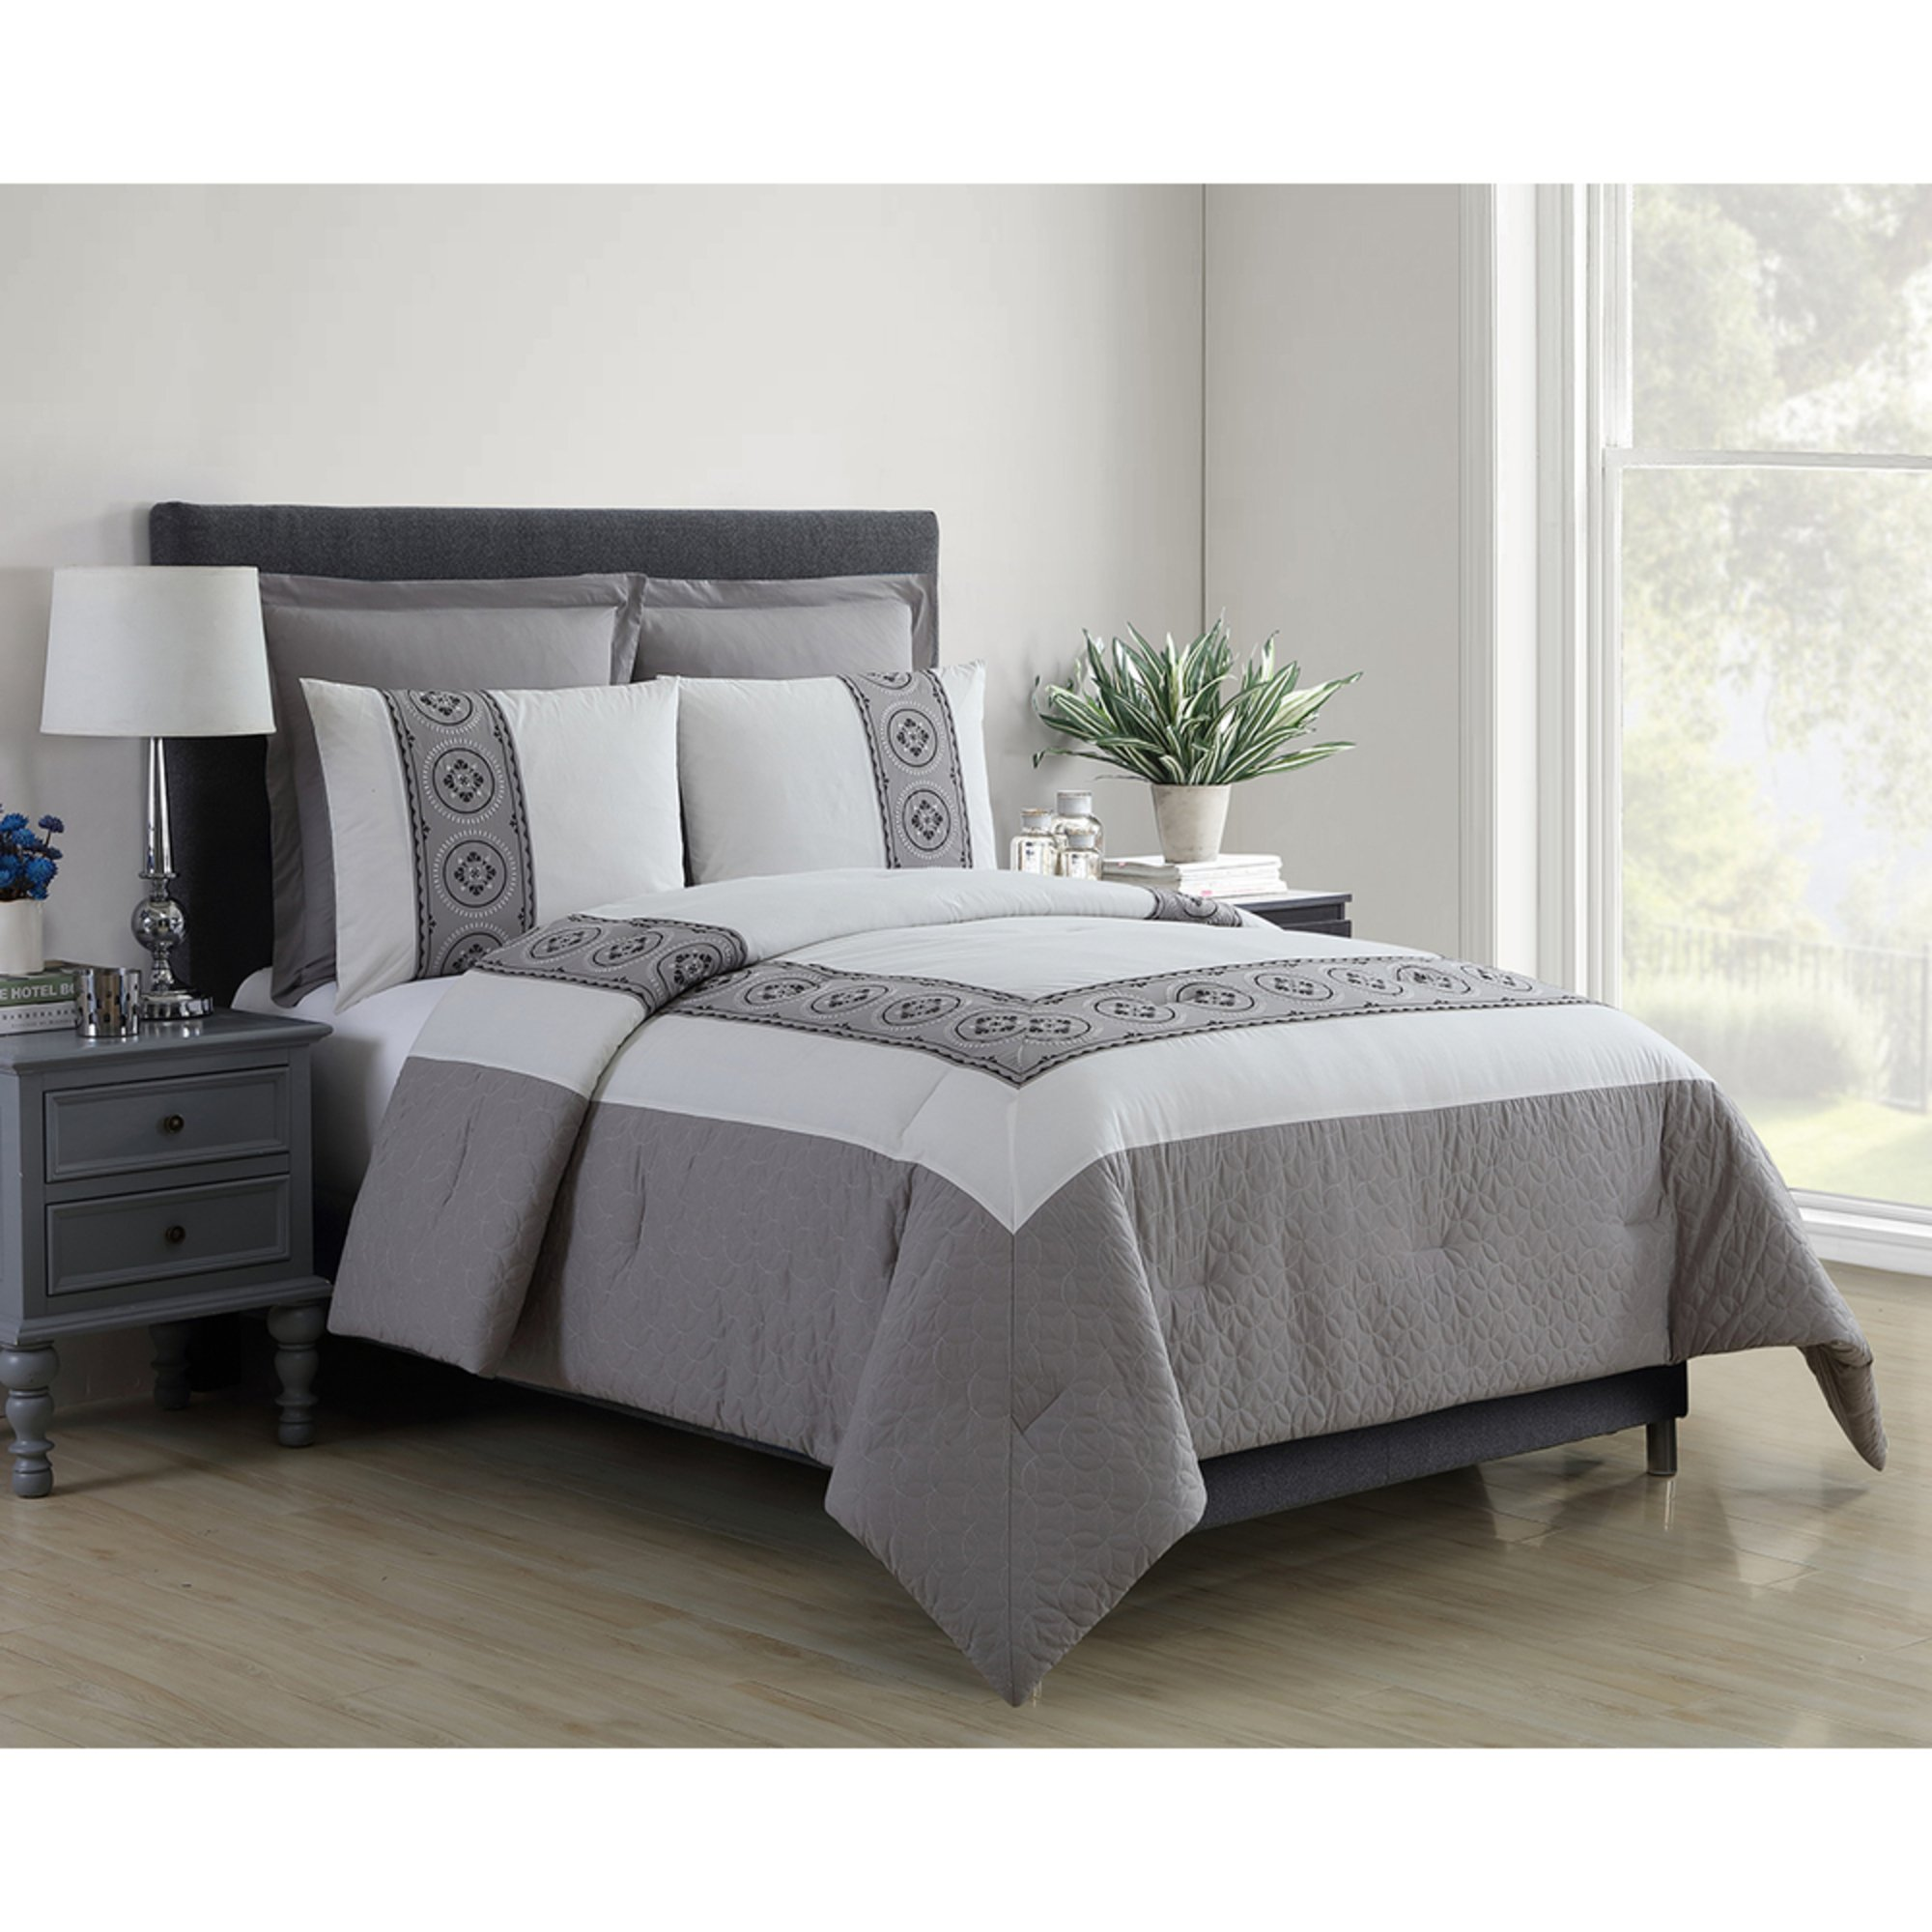 Hotel Collection Platinum: Harbor Home Platinum Collection 5-piece Comforter Set